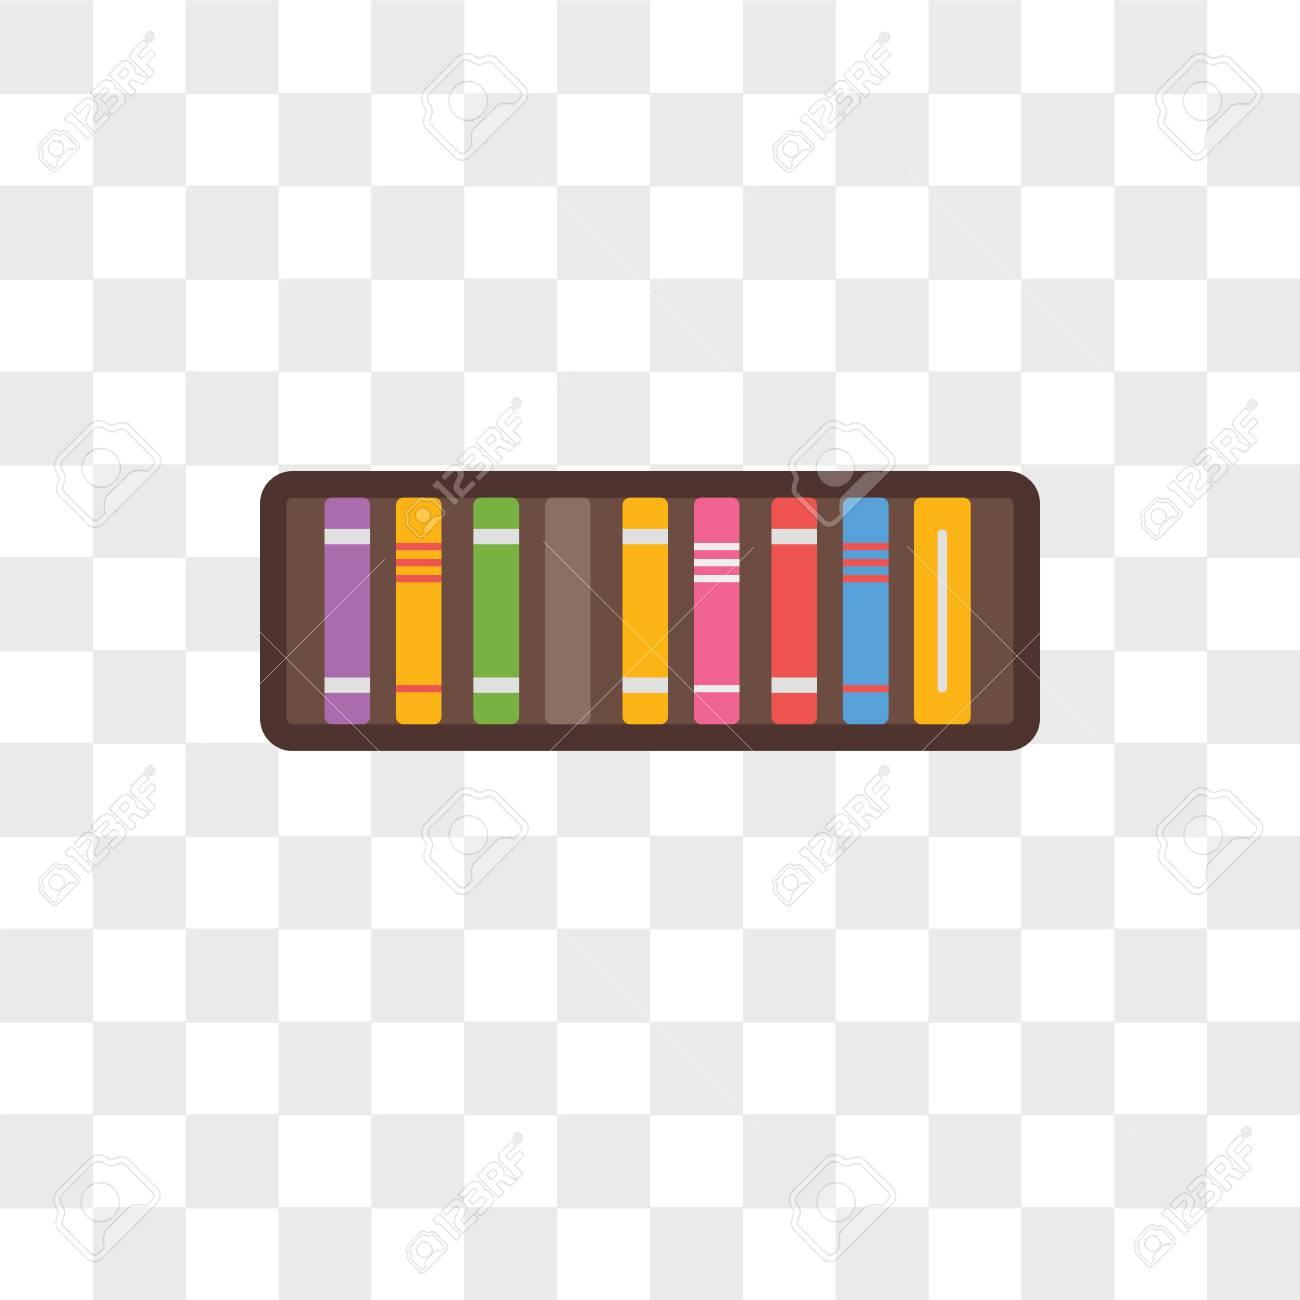 Bookshelf Vector Icon Isolated On Transparent Background